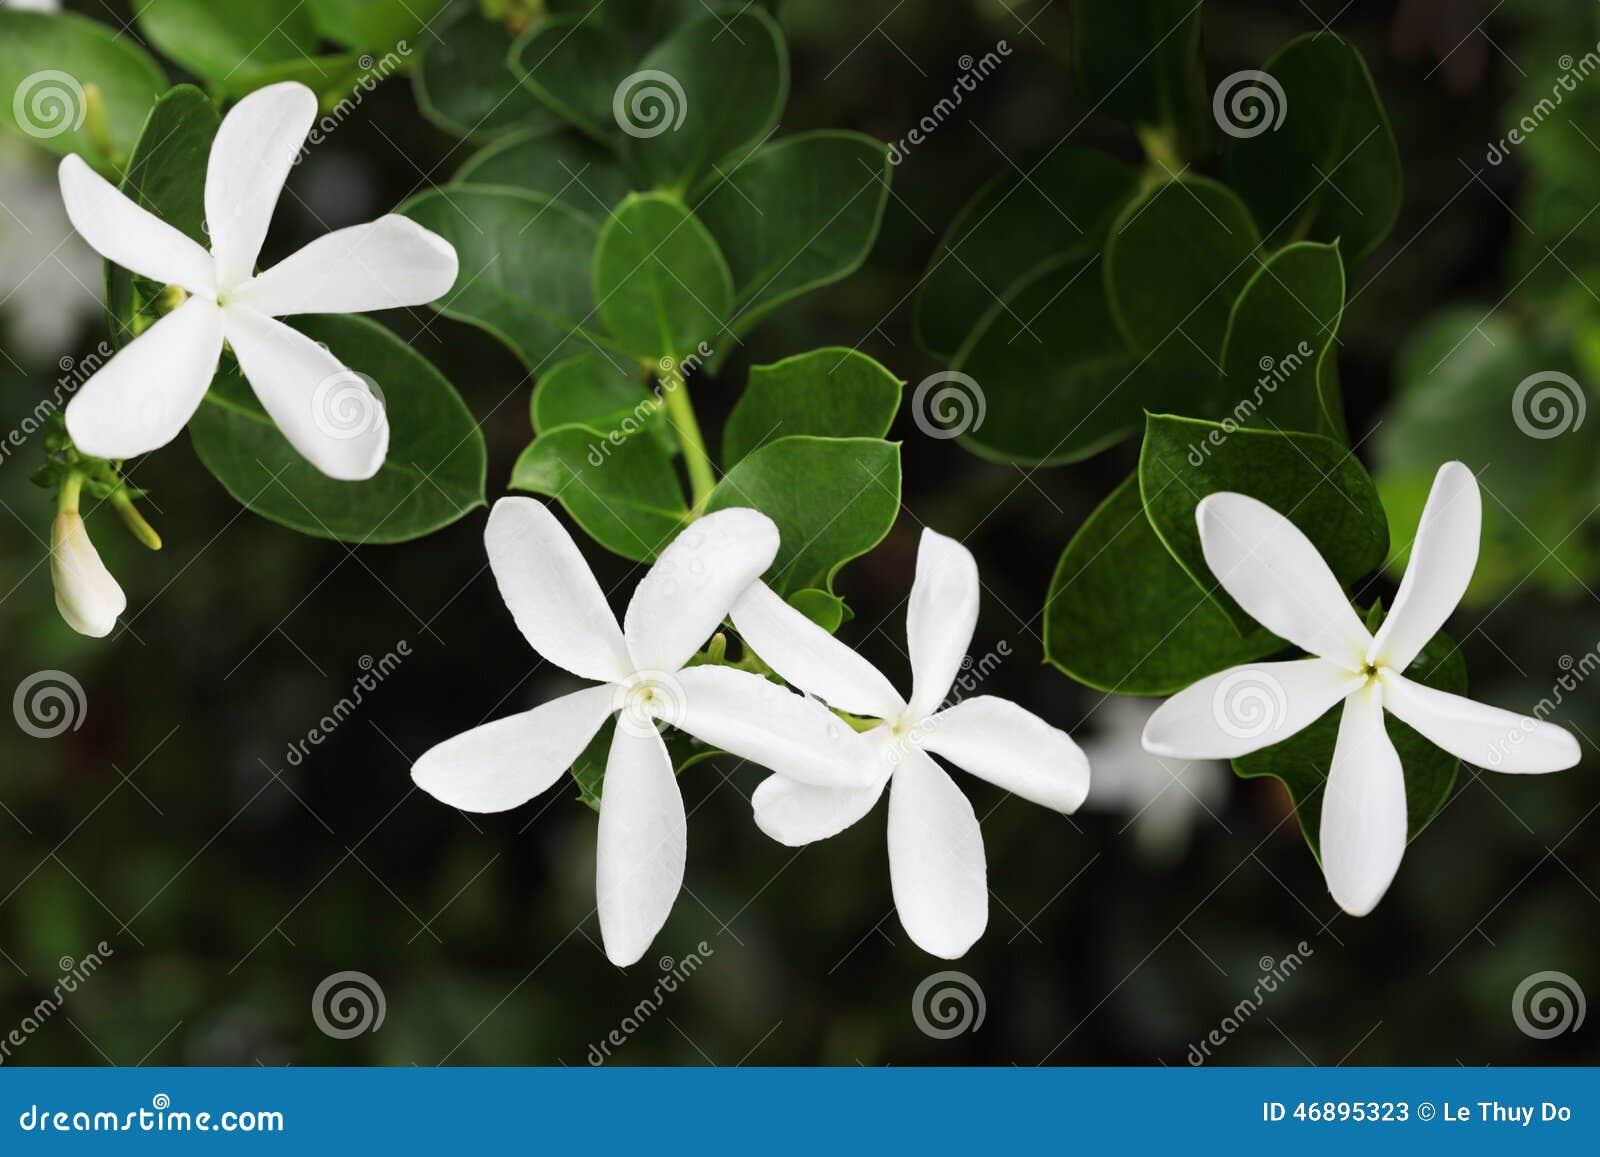 Jasmine flowers stock image image of carissa paniculata 46895323 jasmine flowers izmirmasajfo Choice Image